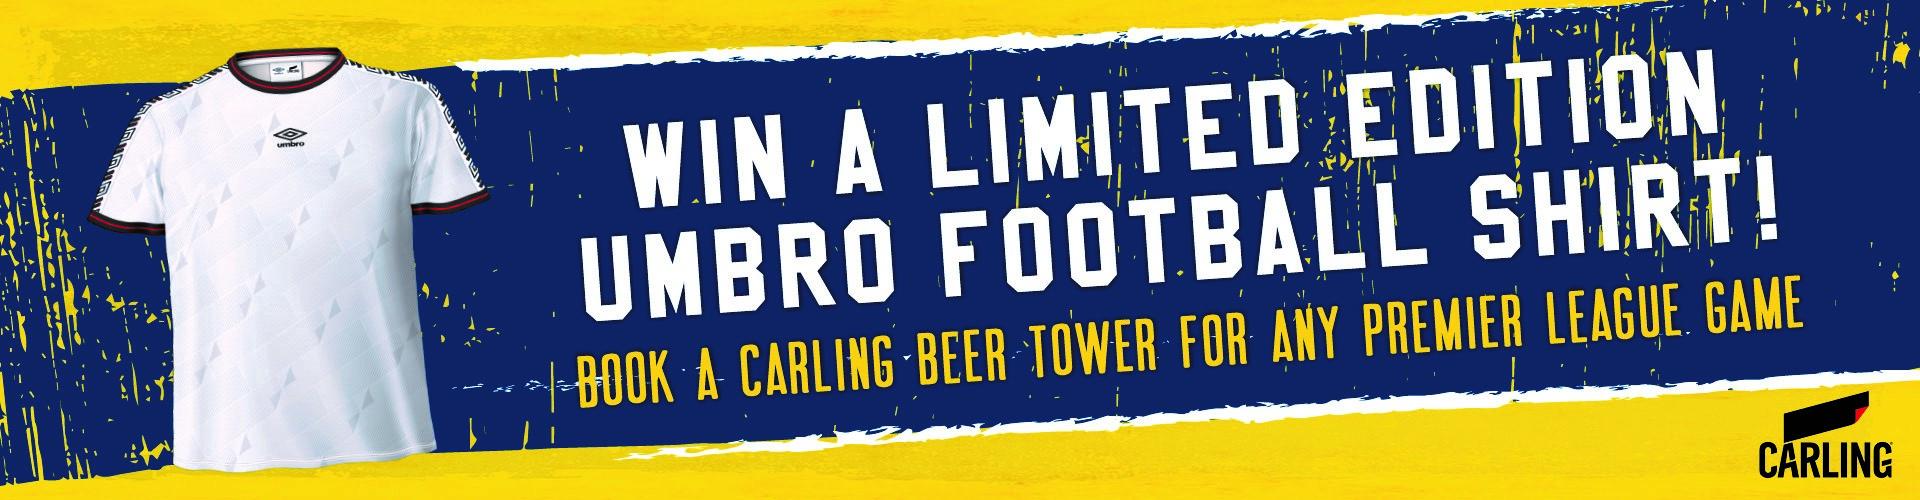 Win a Limited Edition Umbro Football Shirt